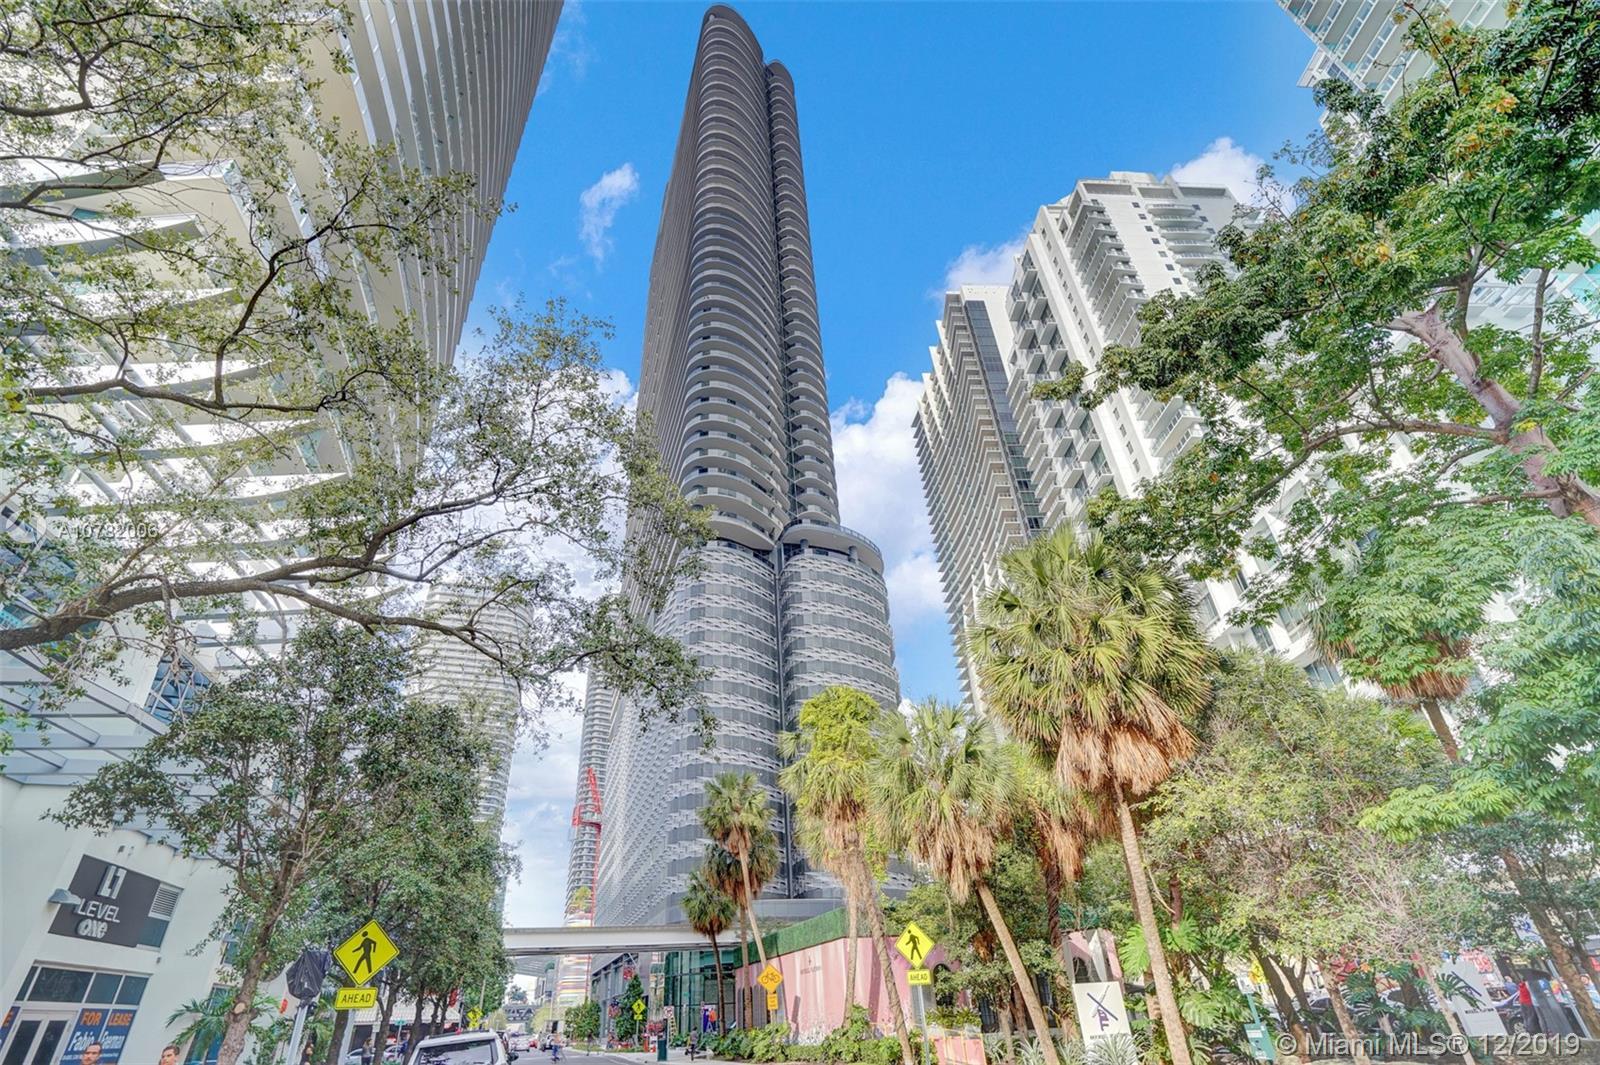 Brickell FlatIron #2215 - 1000 Brickell Plaza #2215, Miami, FL 33131